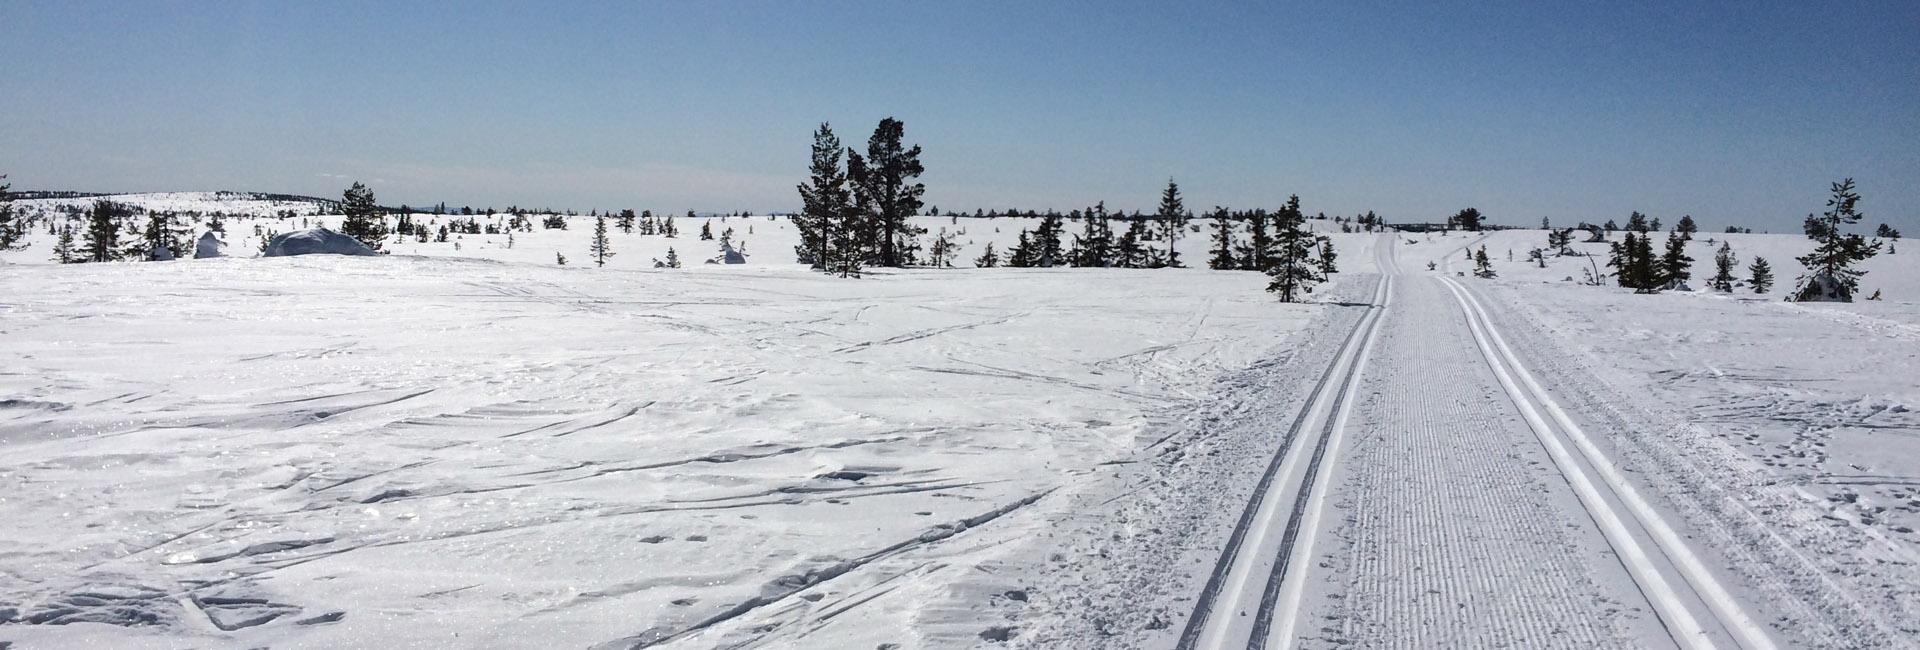 Flotte skiløyper